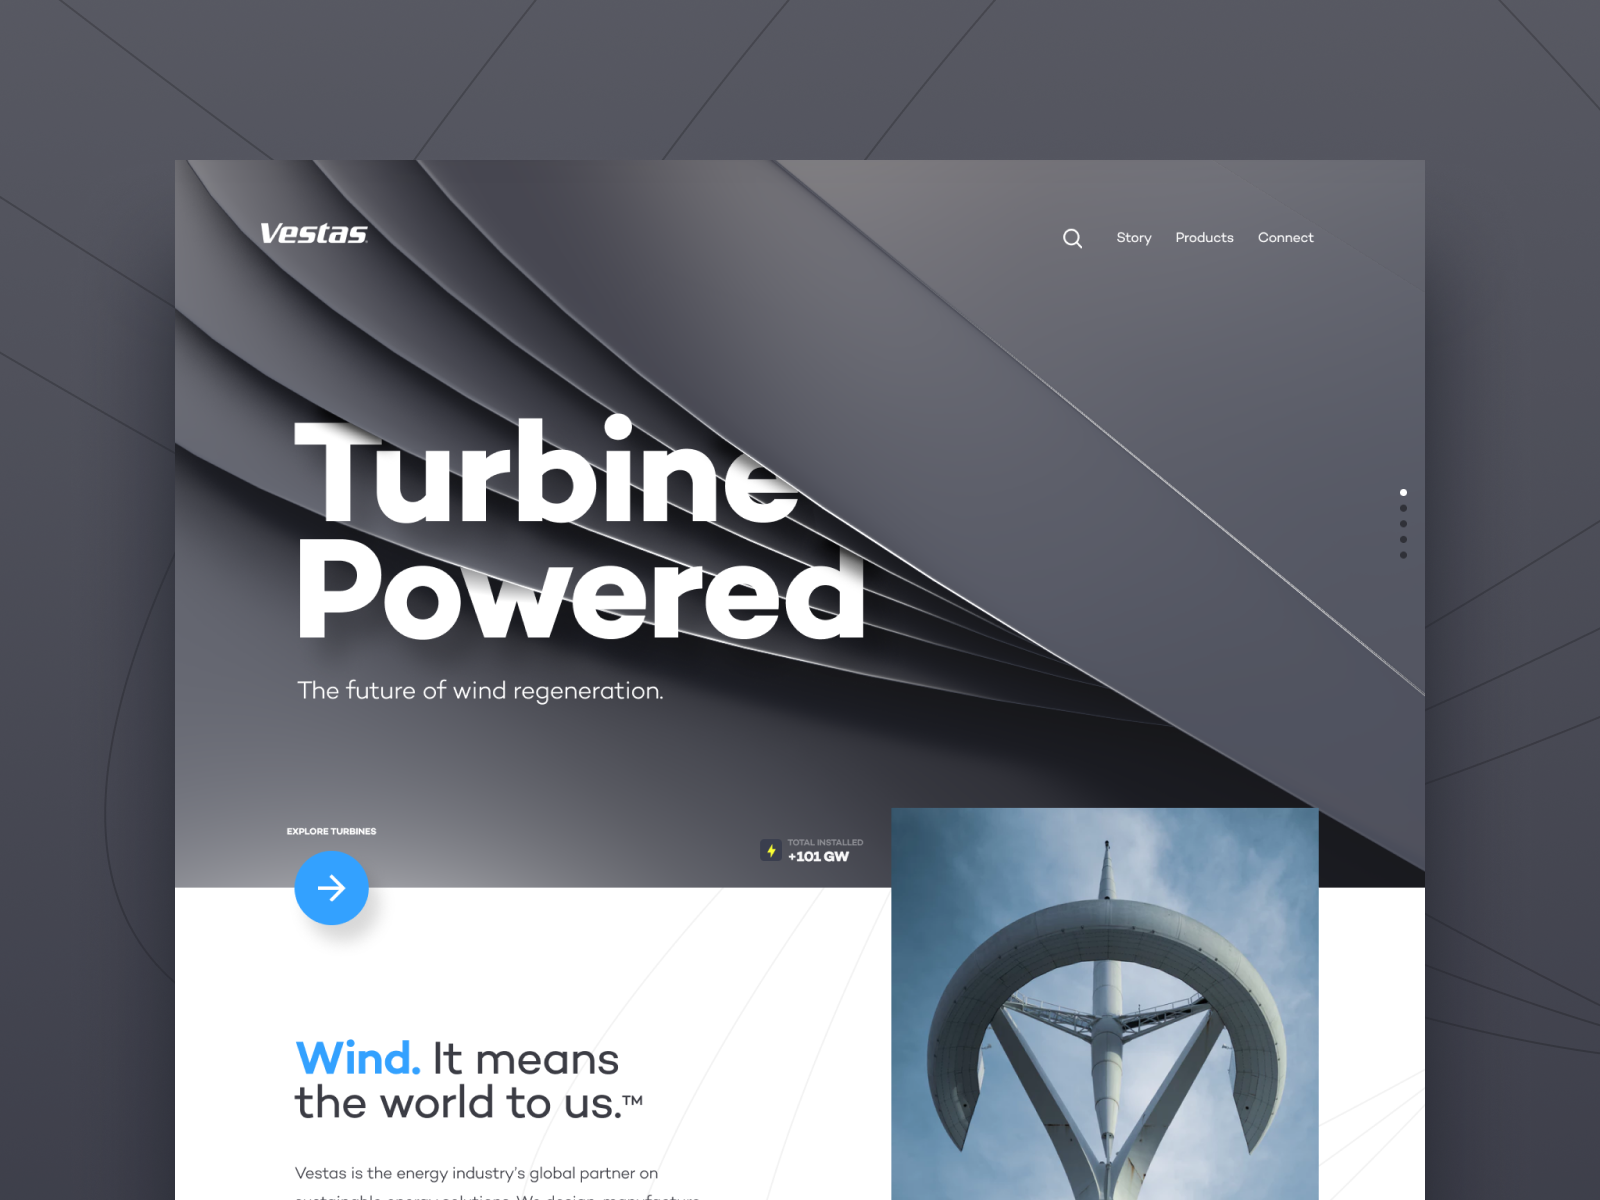 Turbine powered